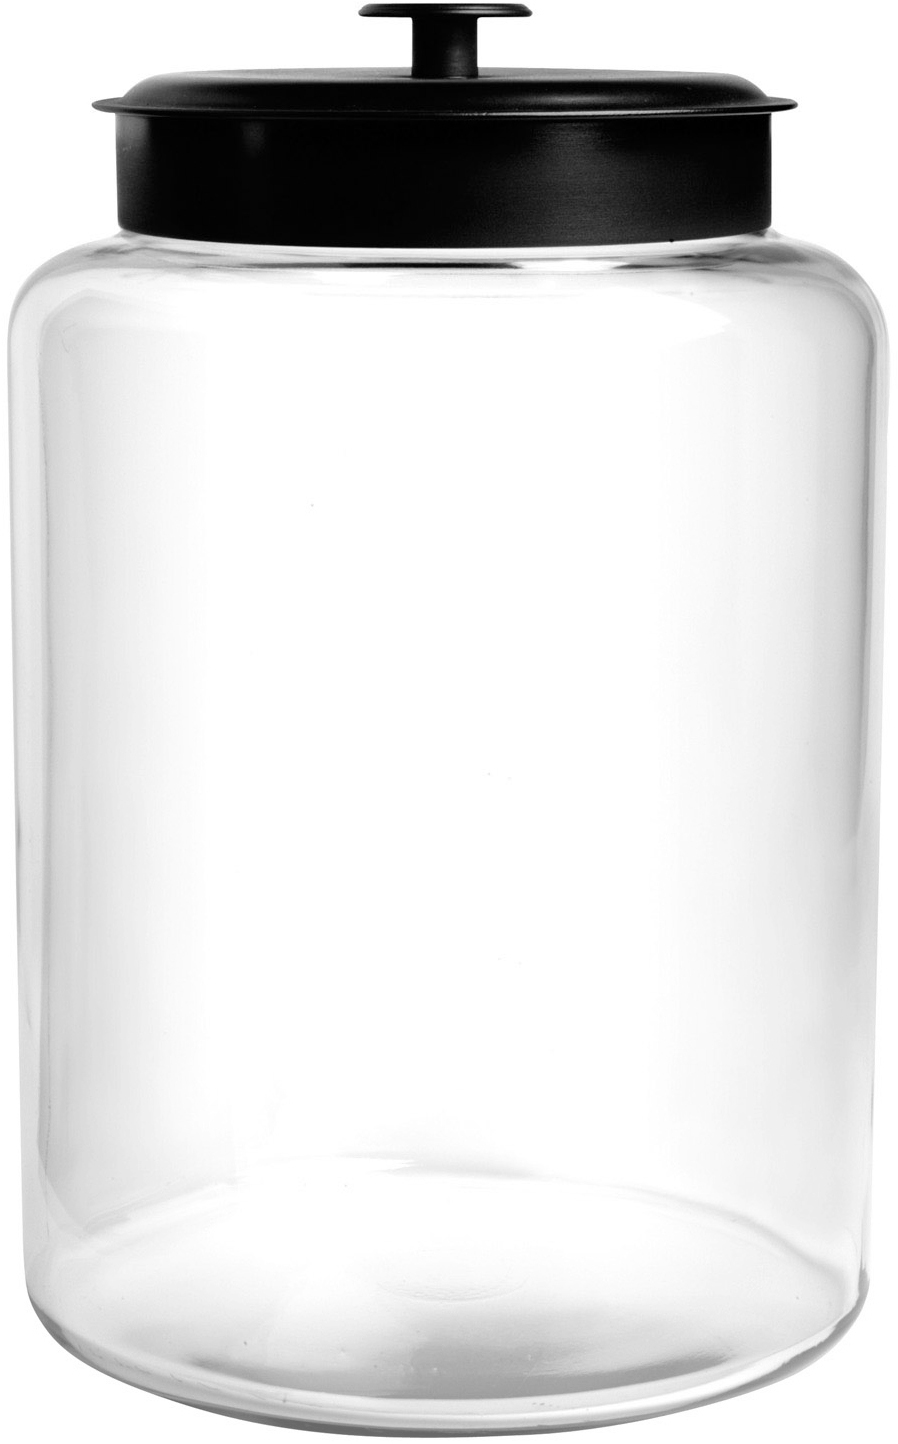 Anchor Hocking Glass Montana Jar with Black Aluminum Cover, 2.5 Gallon